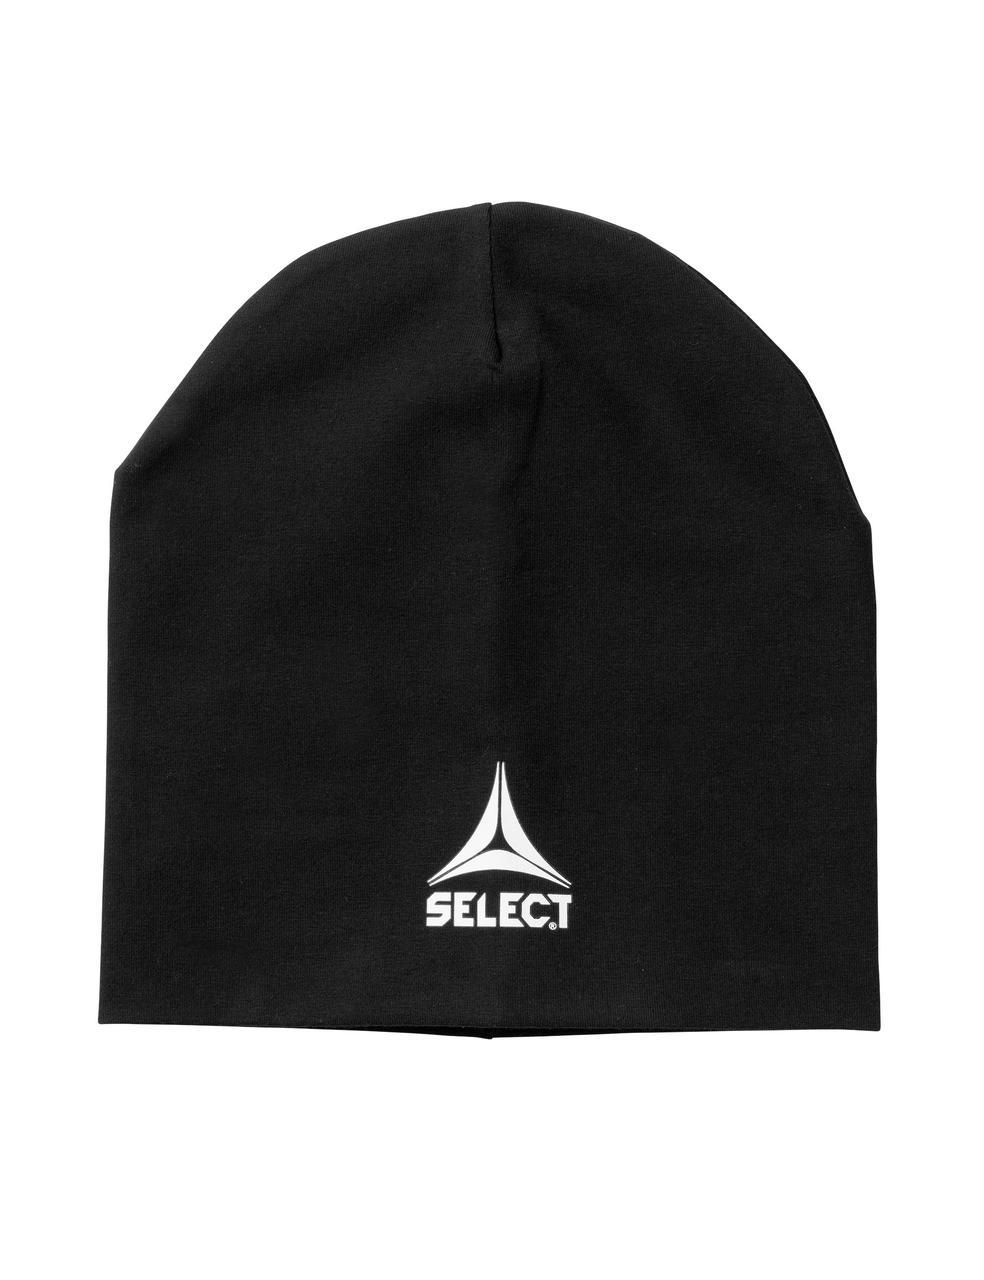 Шапка SELECT Knitted cap (черная)